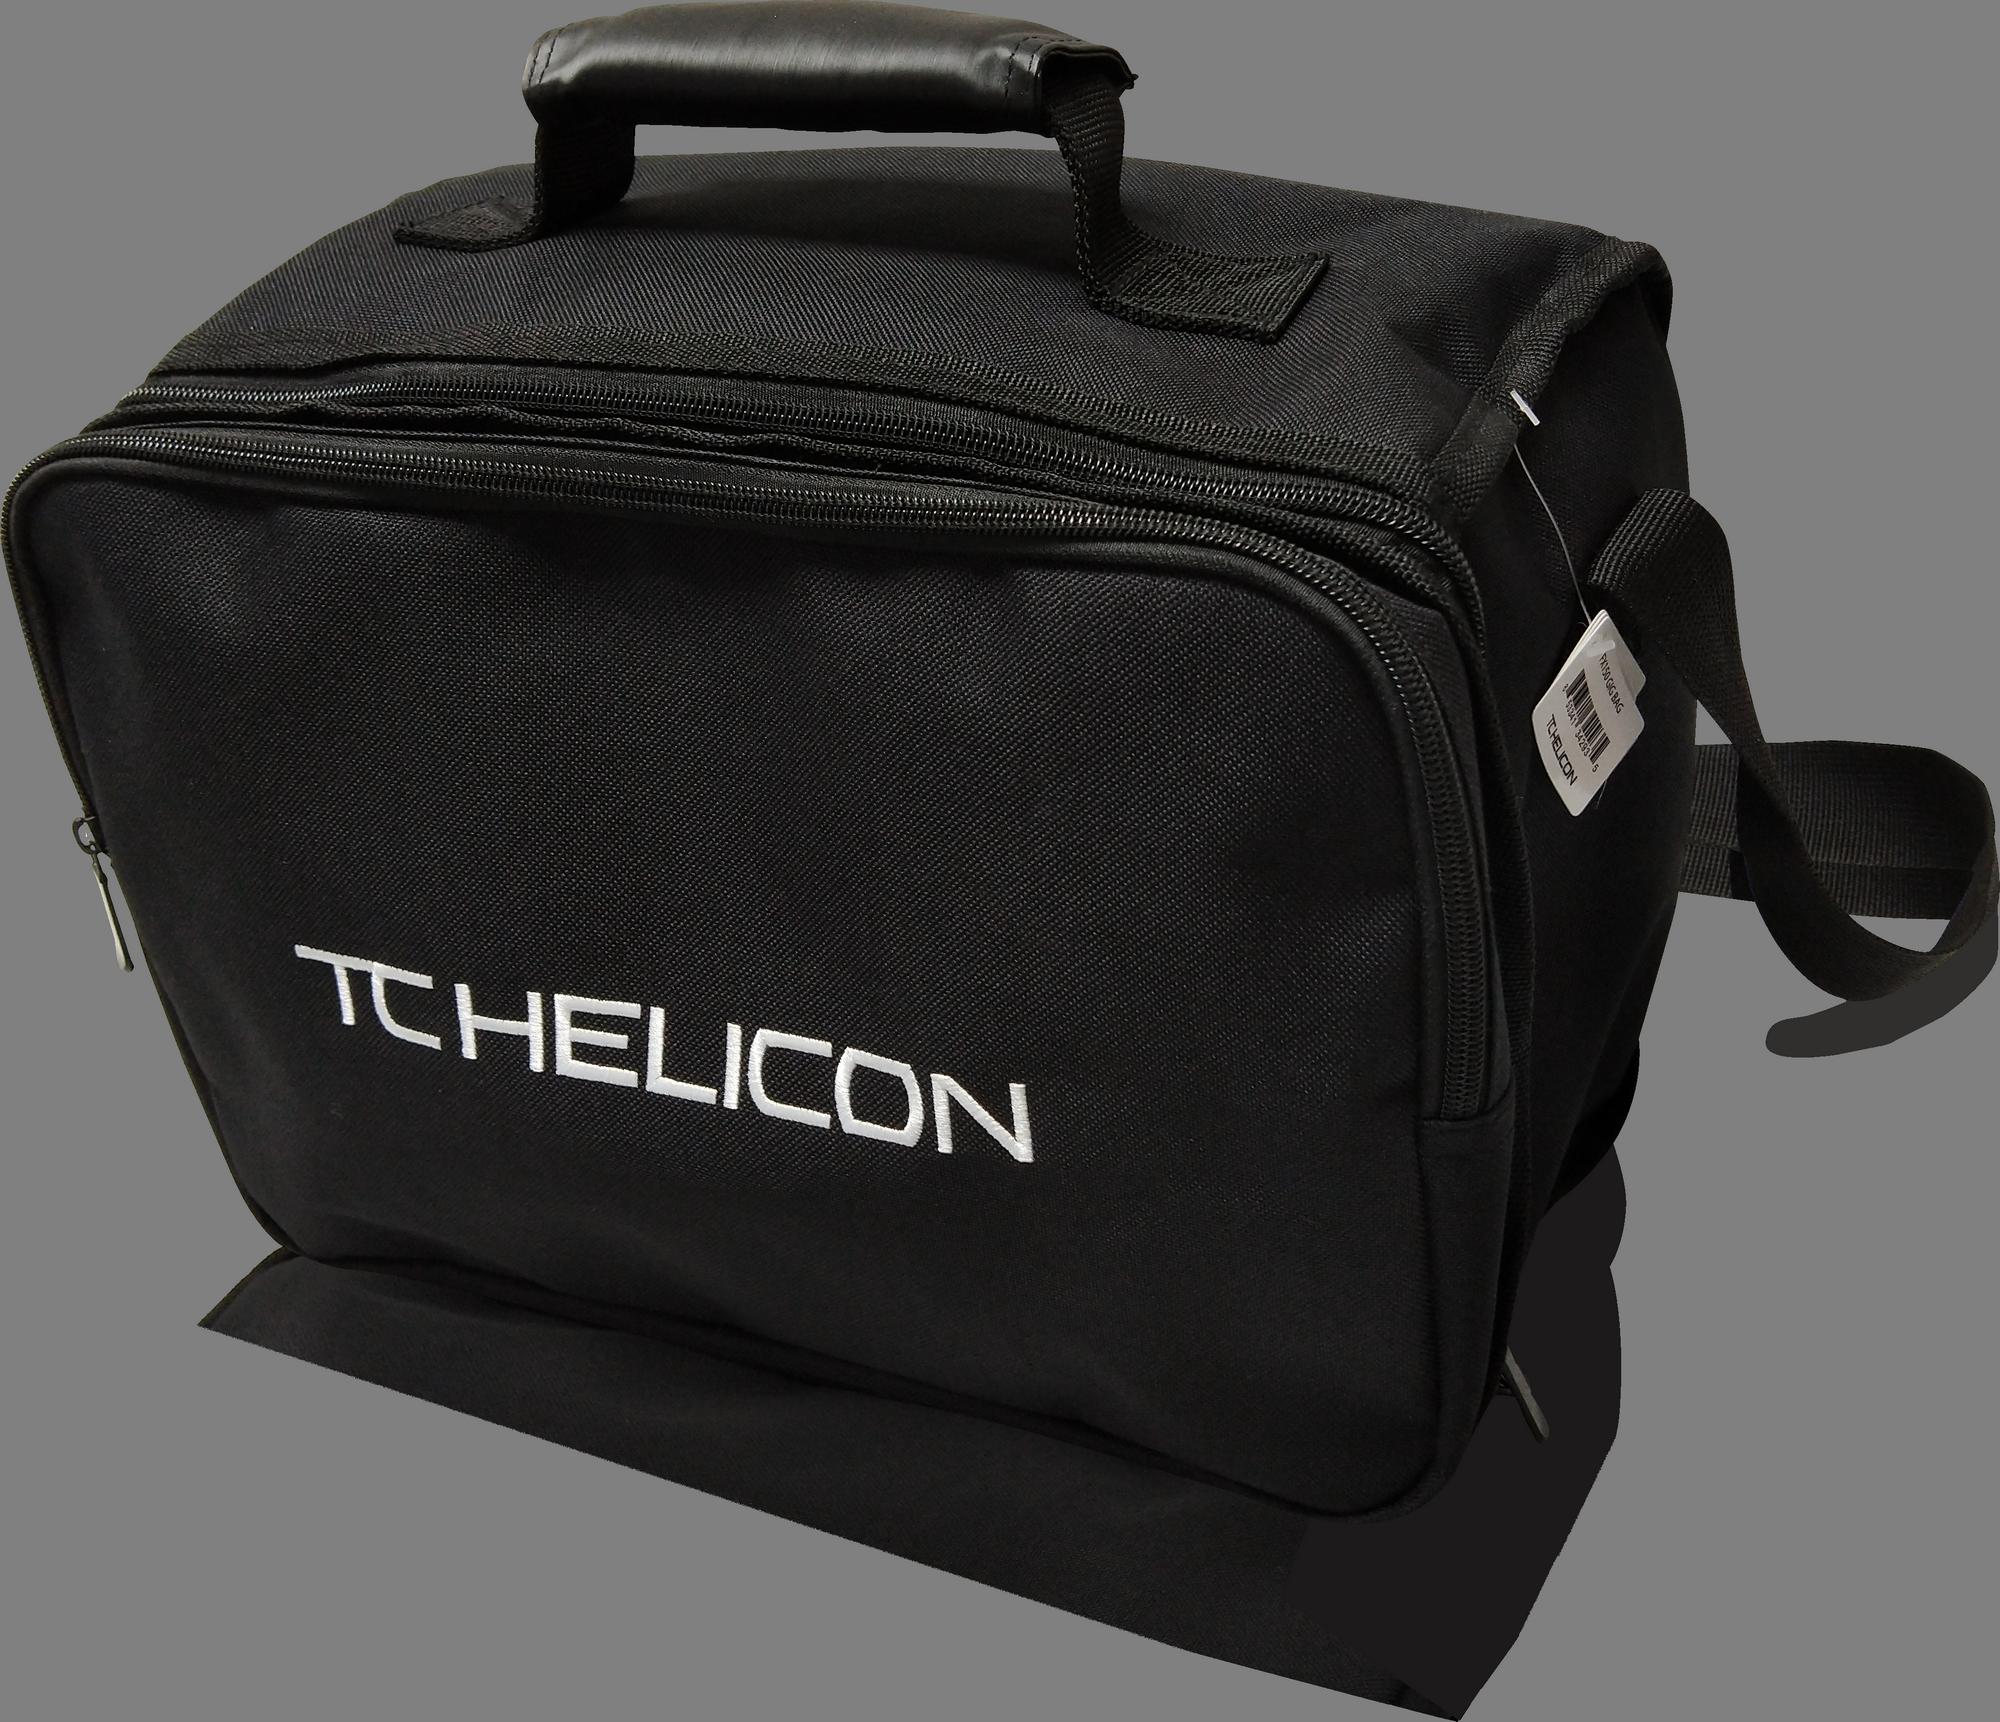 TC Helicon FX150 GIG BAG - Travel bag